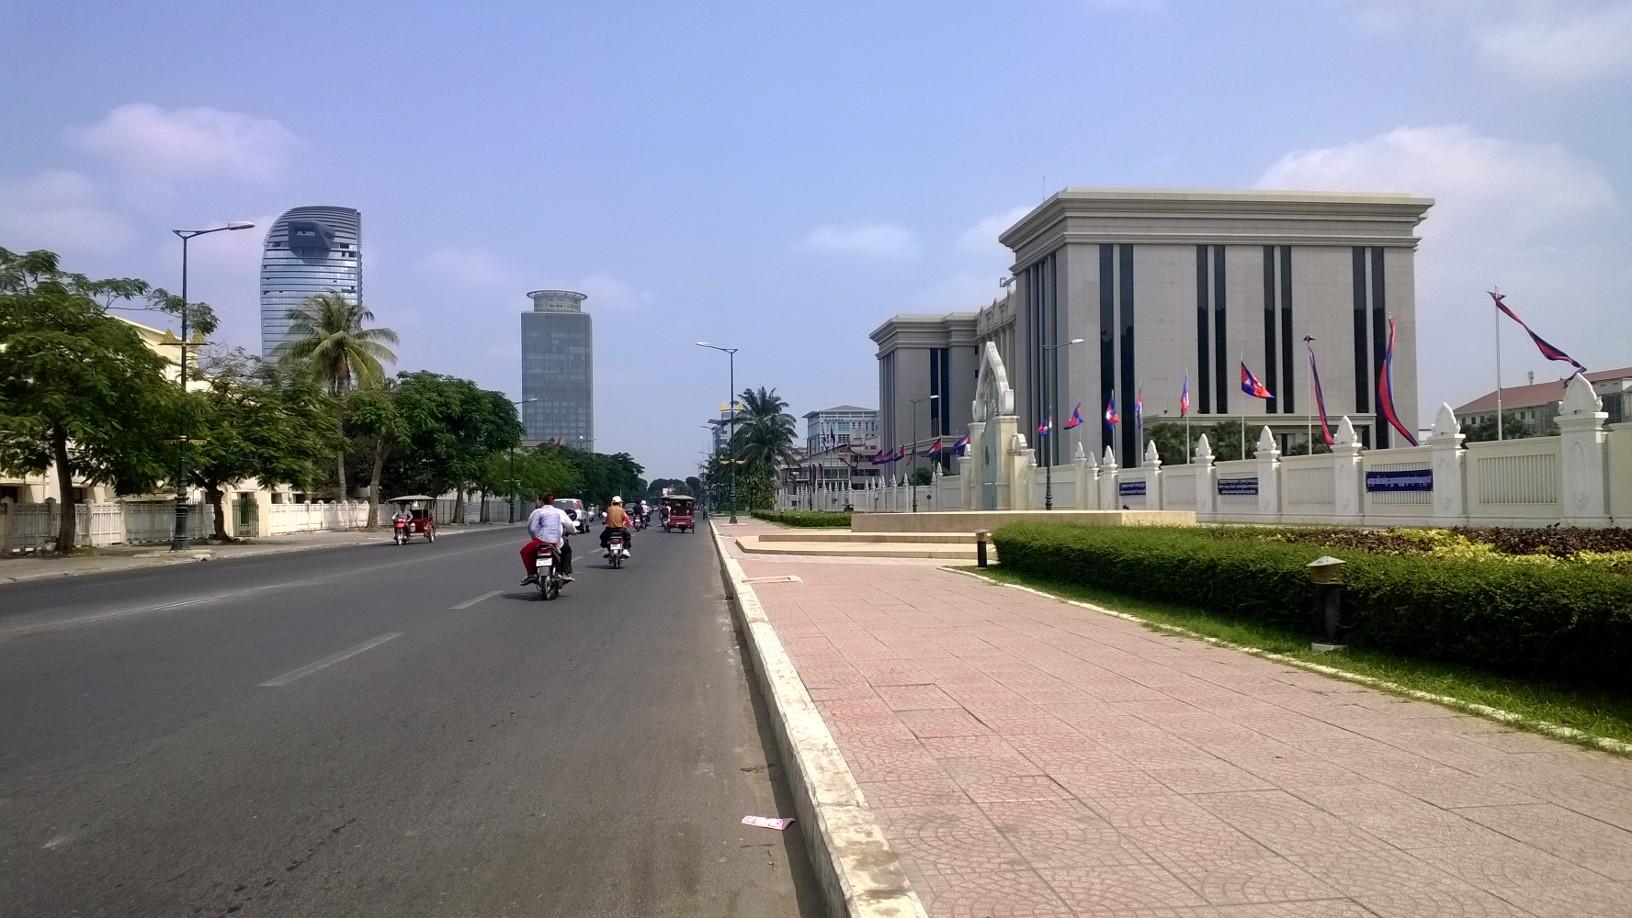 Phnom Penh today. Photo credit: Blue Lady Blog